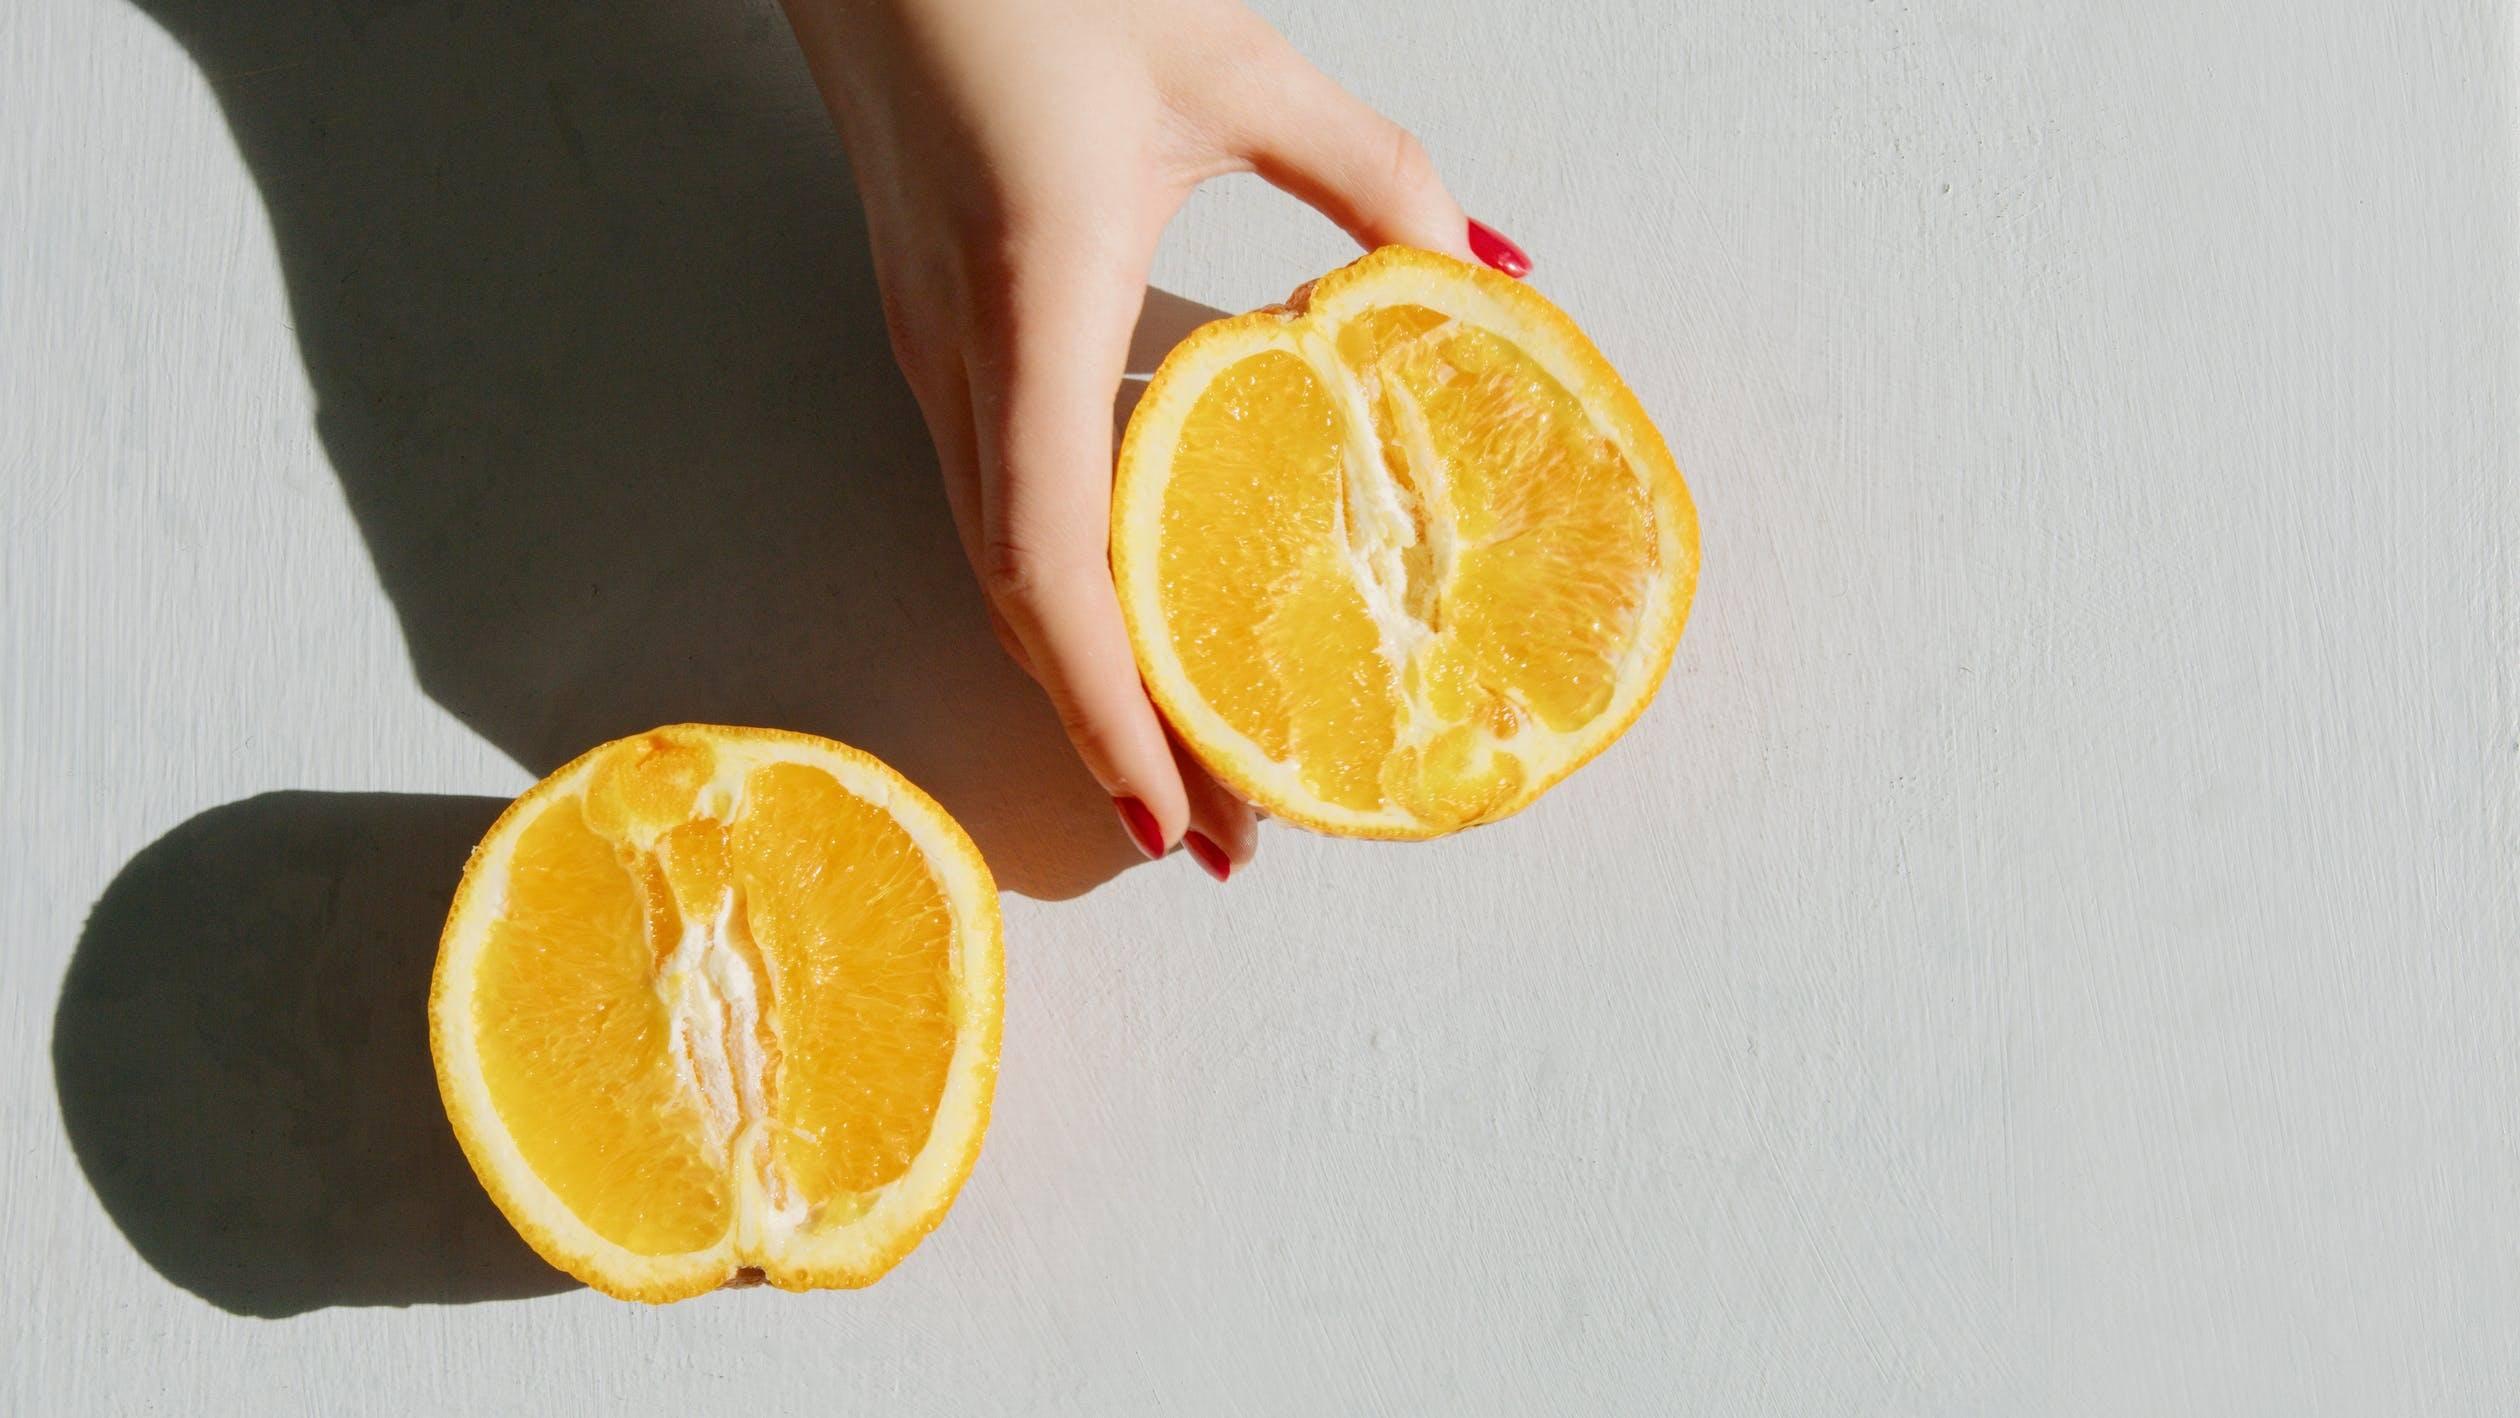 Person Holding Sliced Orange